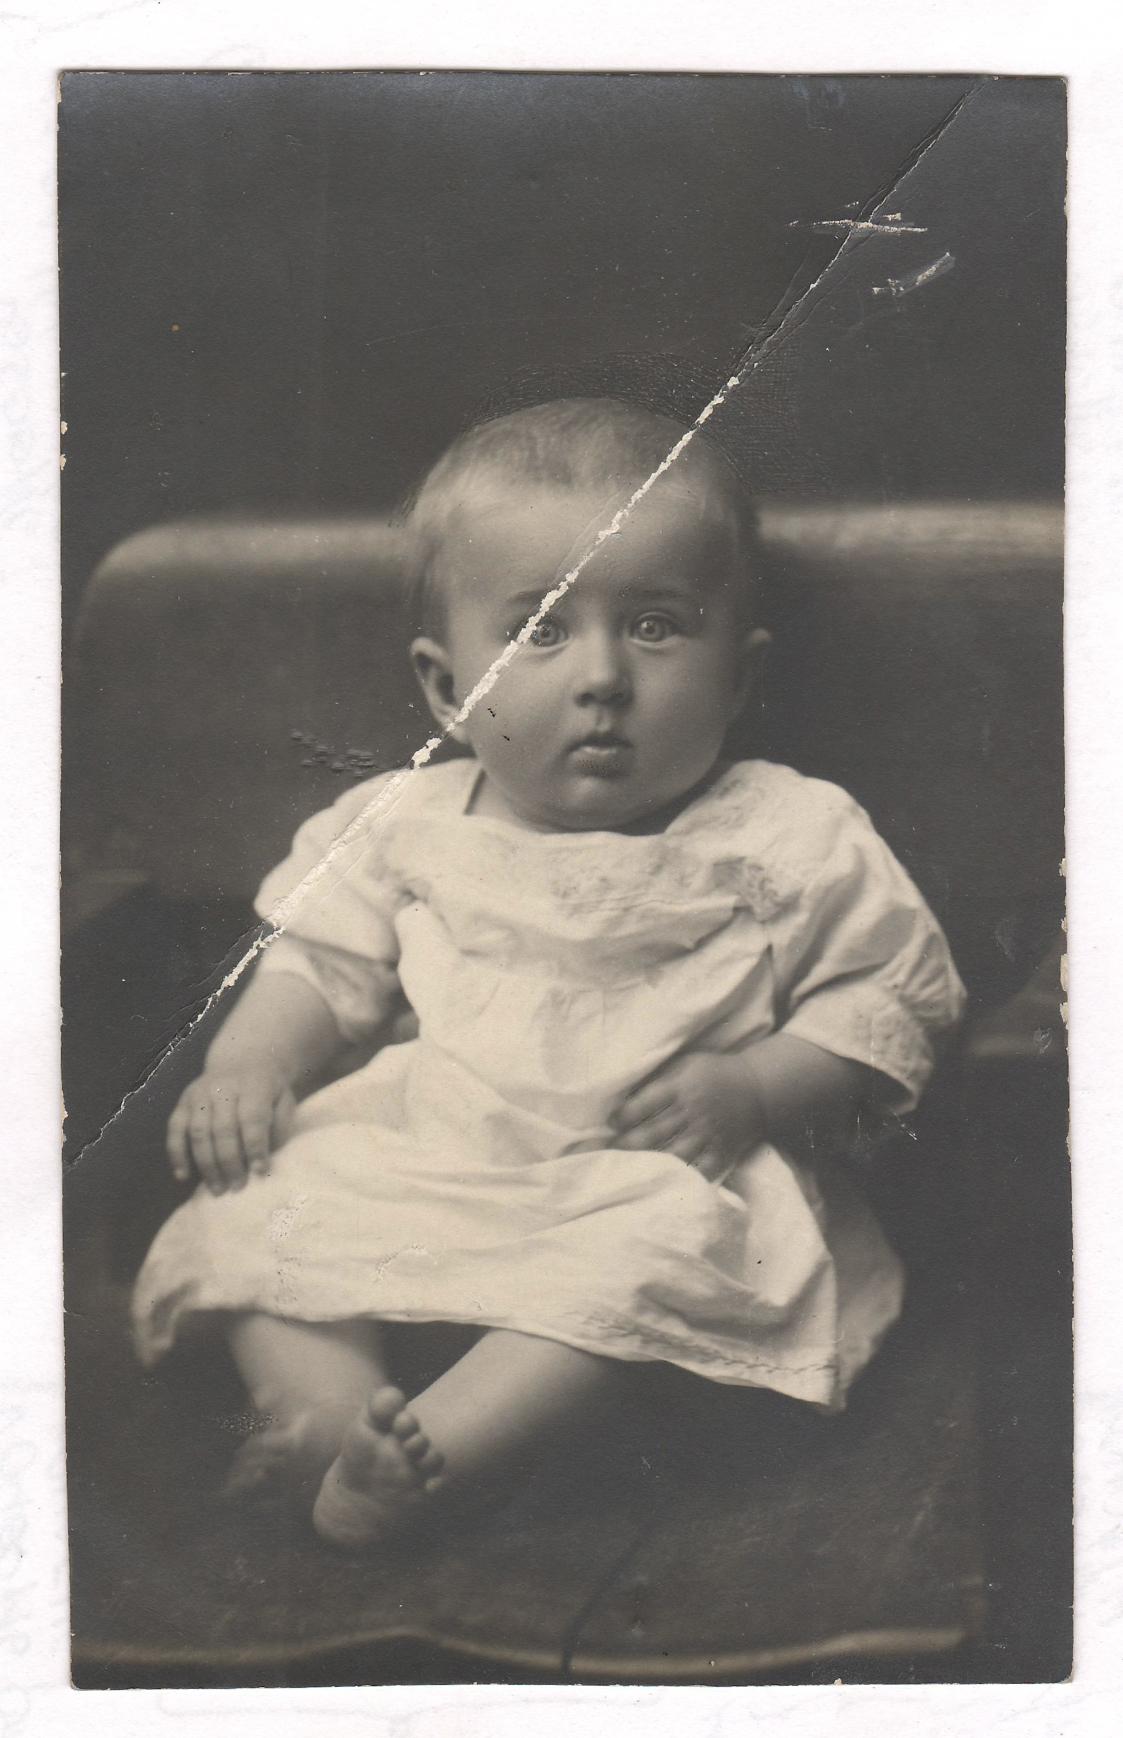 Photo Restoration Services Online - We restore photograph ...